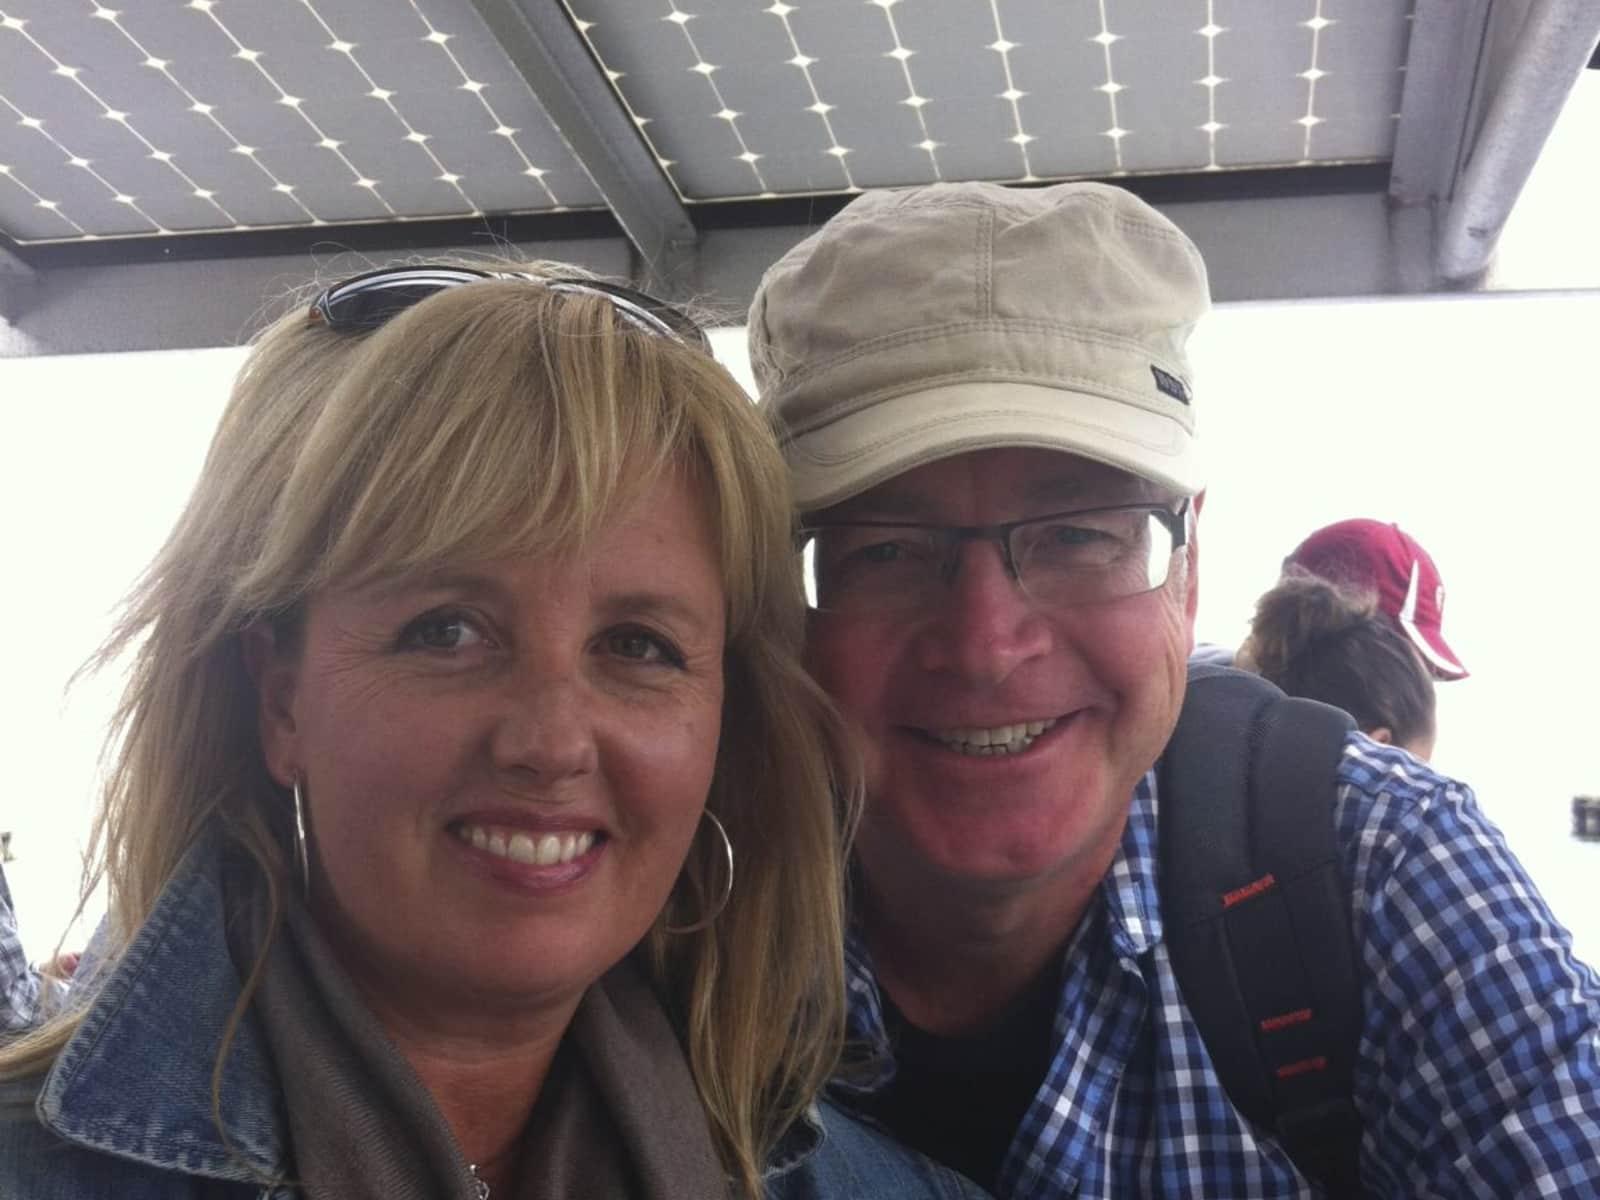 Paula & Andy from Stratford, Ontario, Canada